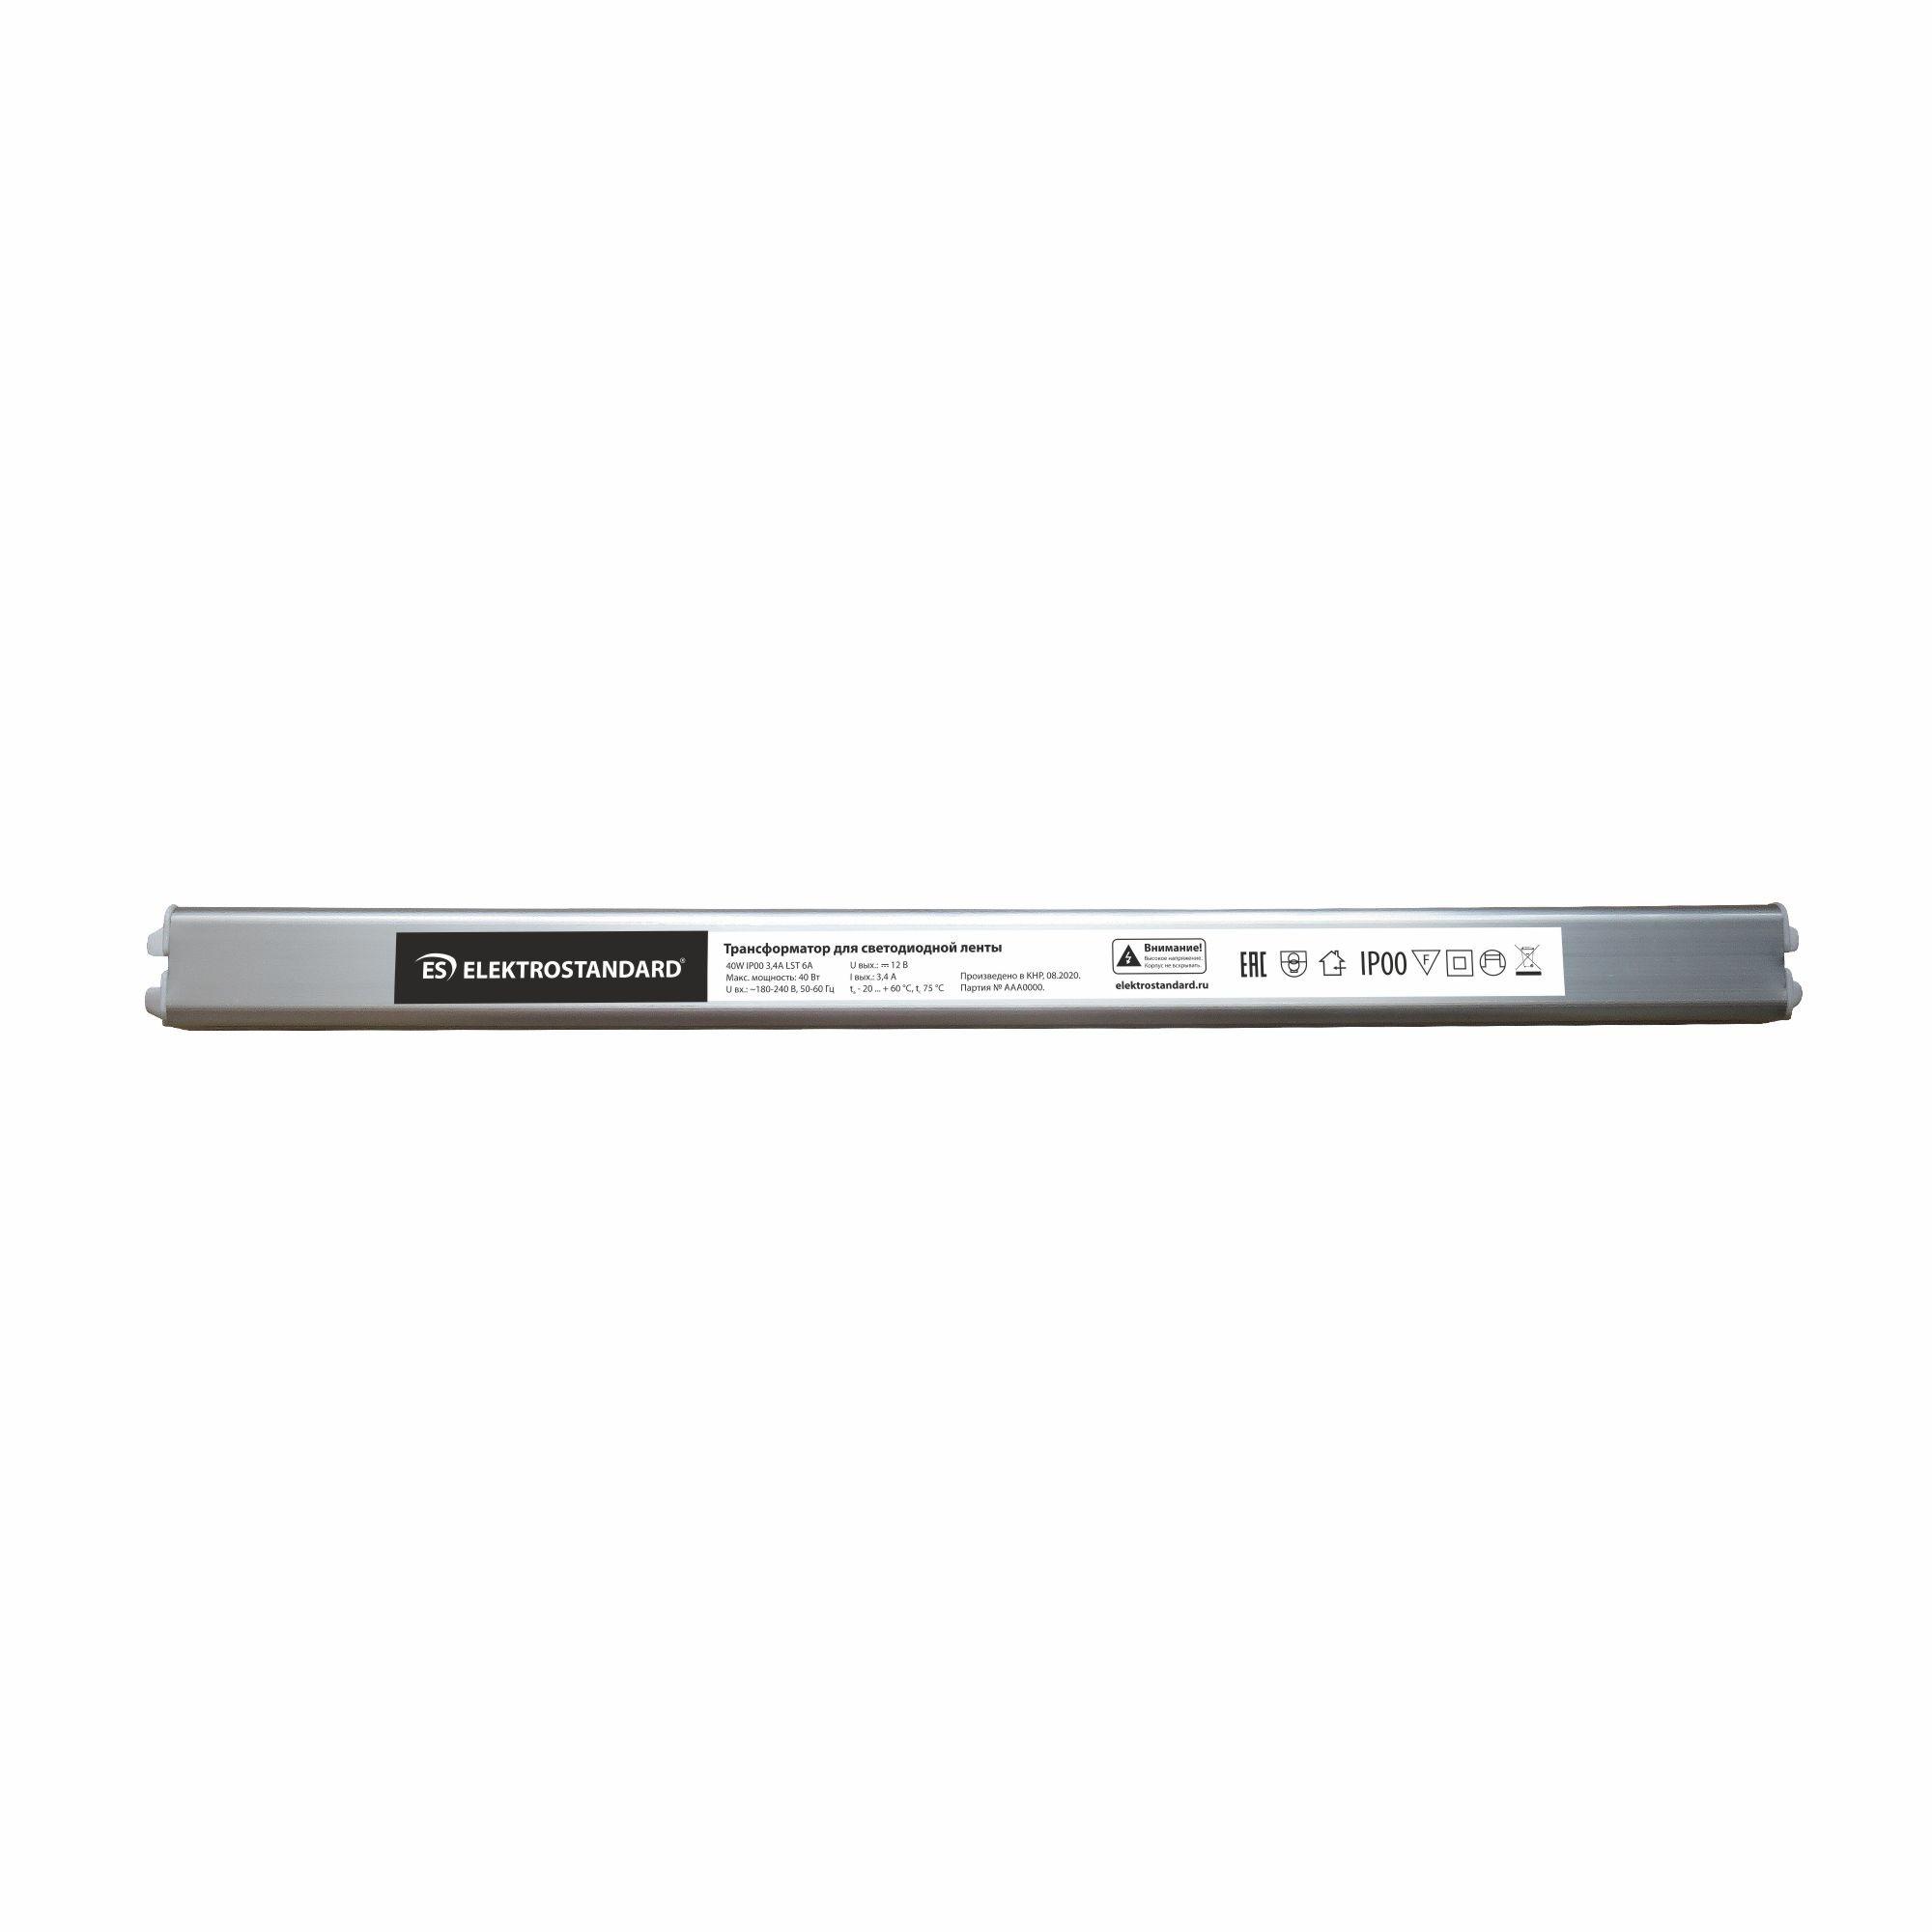 Узкий трансформатор 40W IP00 3,4A LST 6A